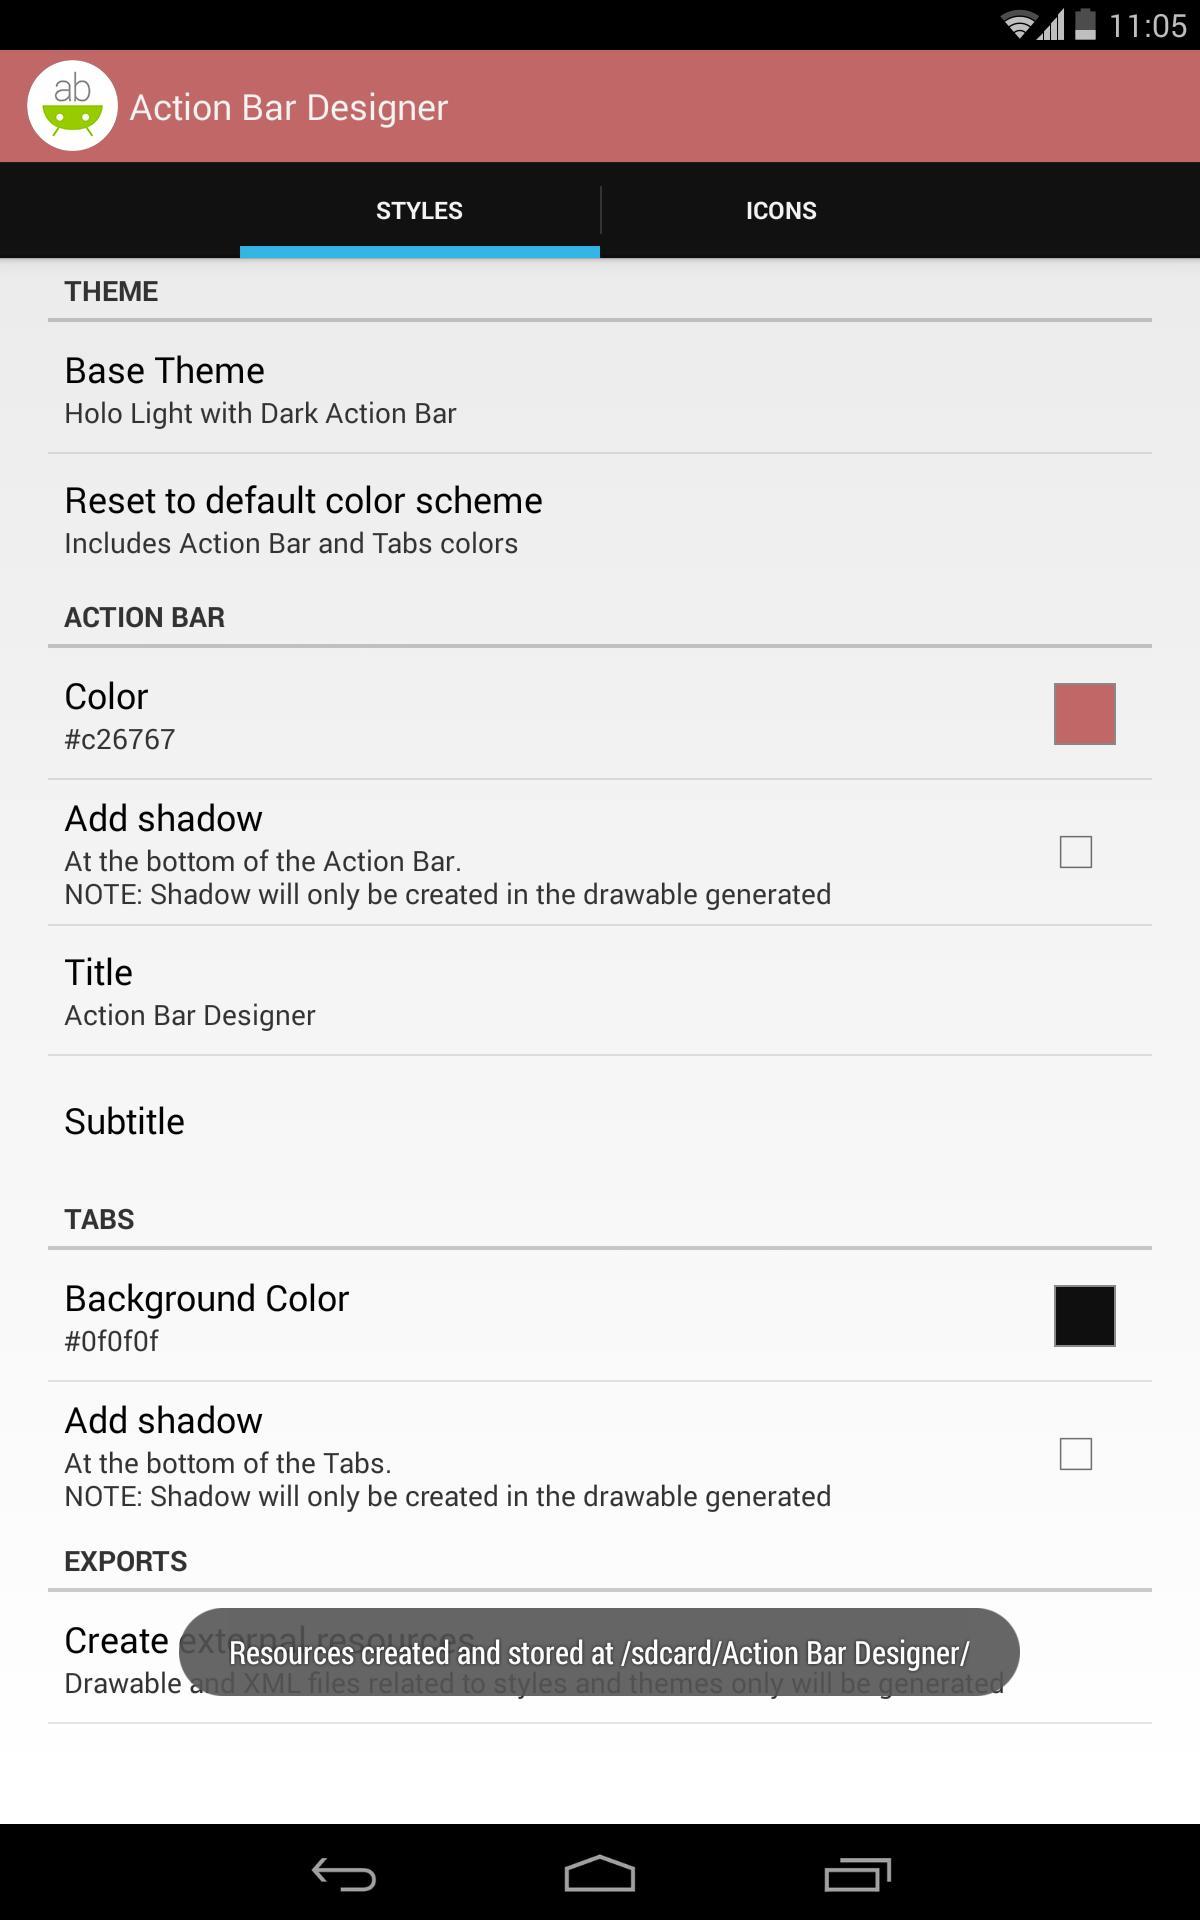 Action Bar Designer for Android - APK Download